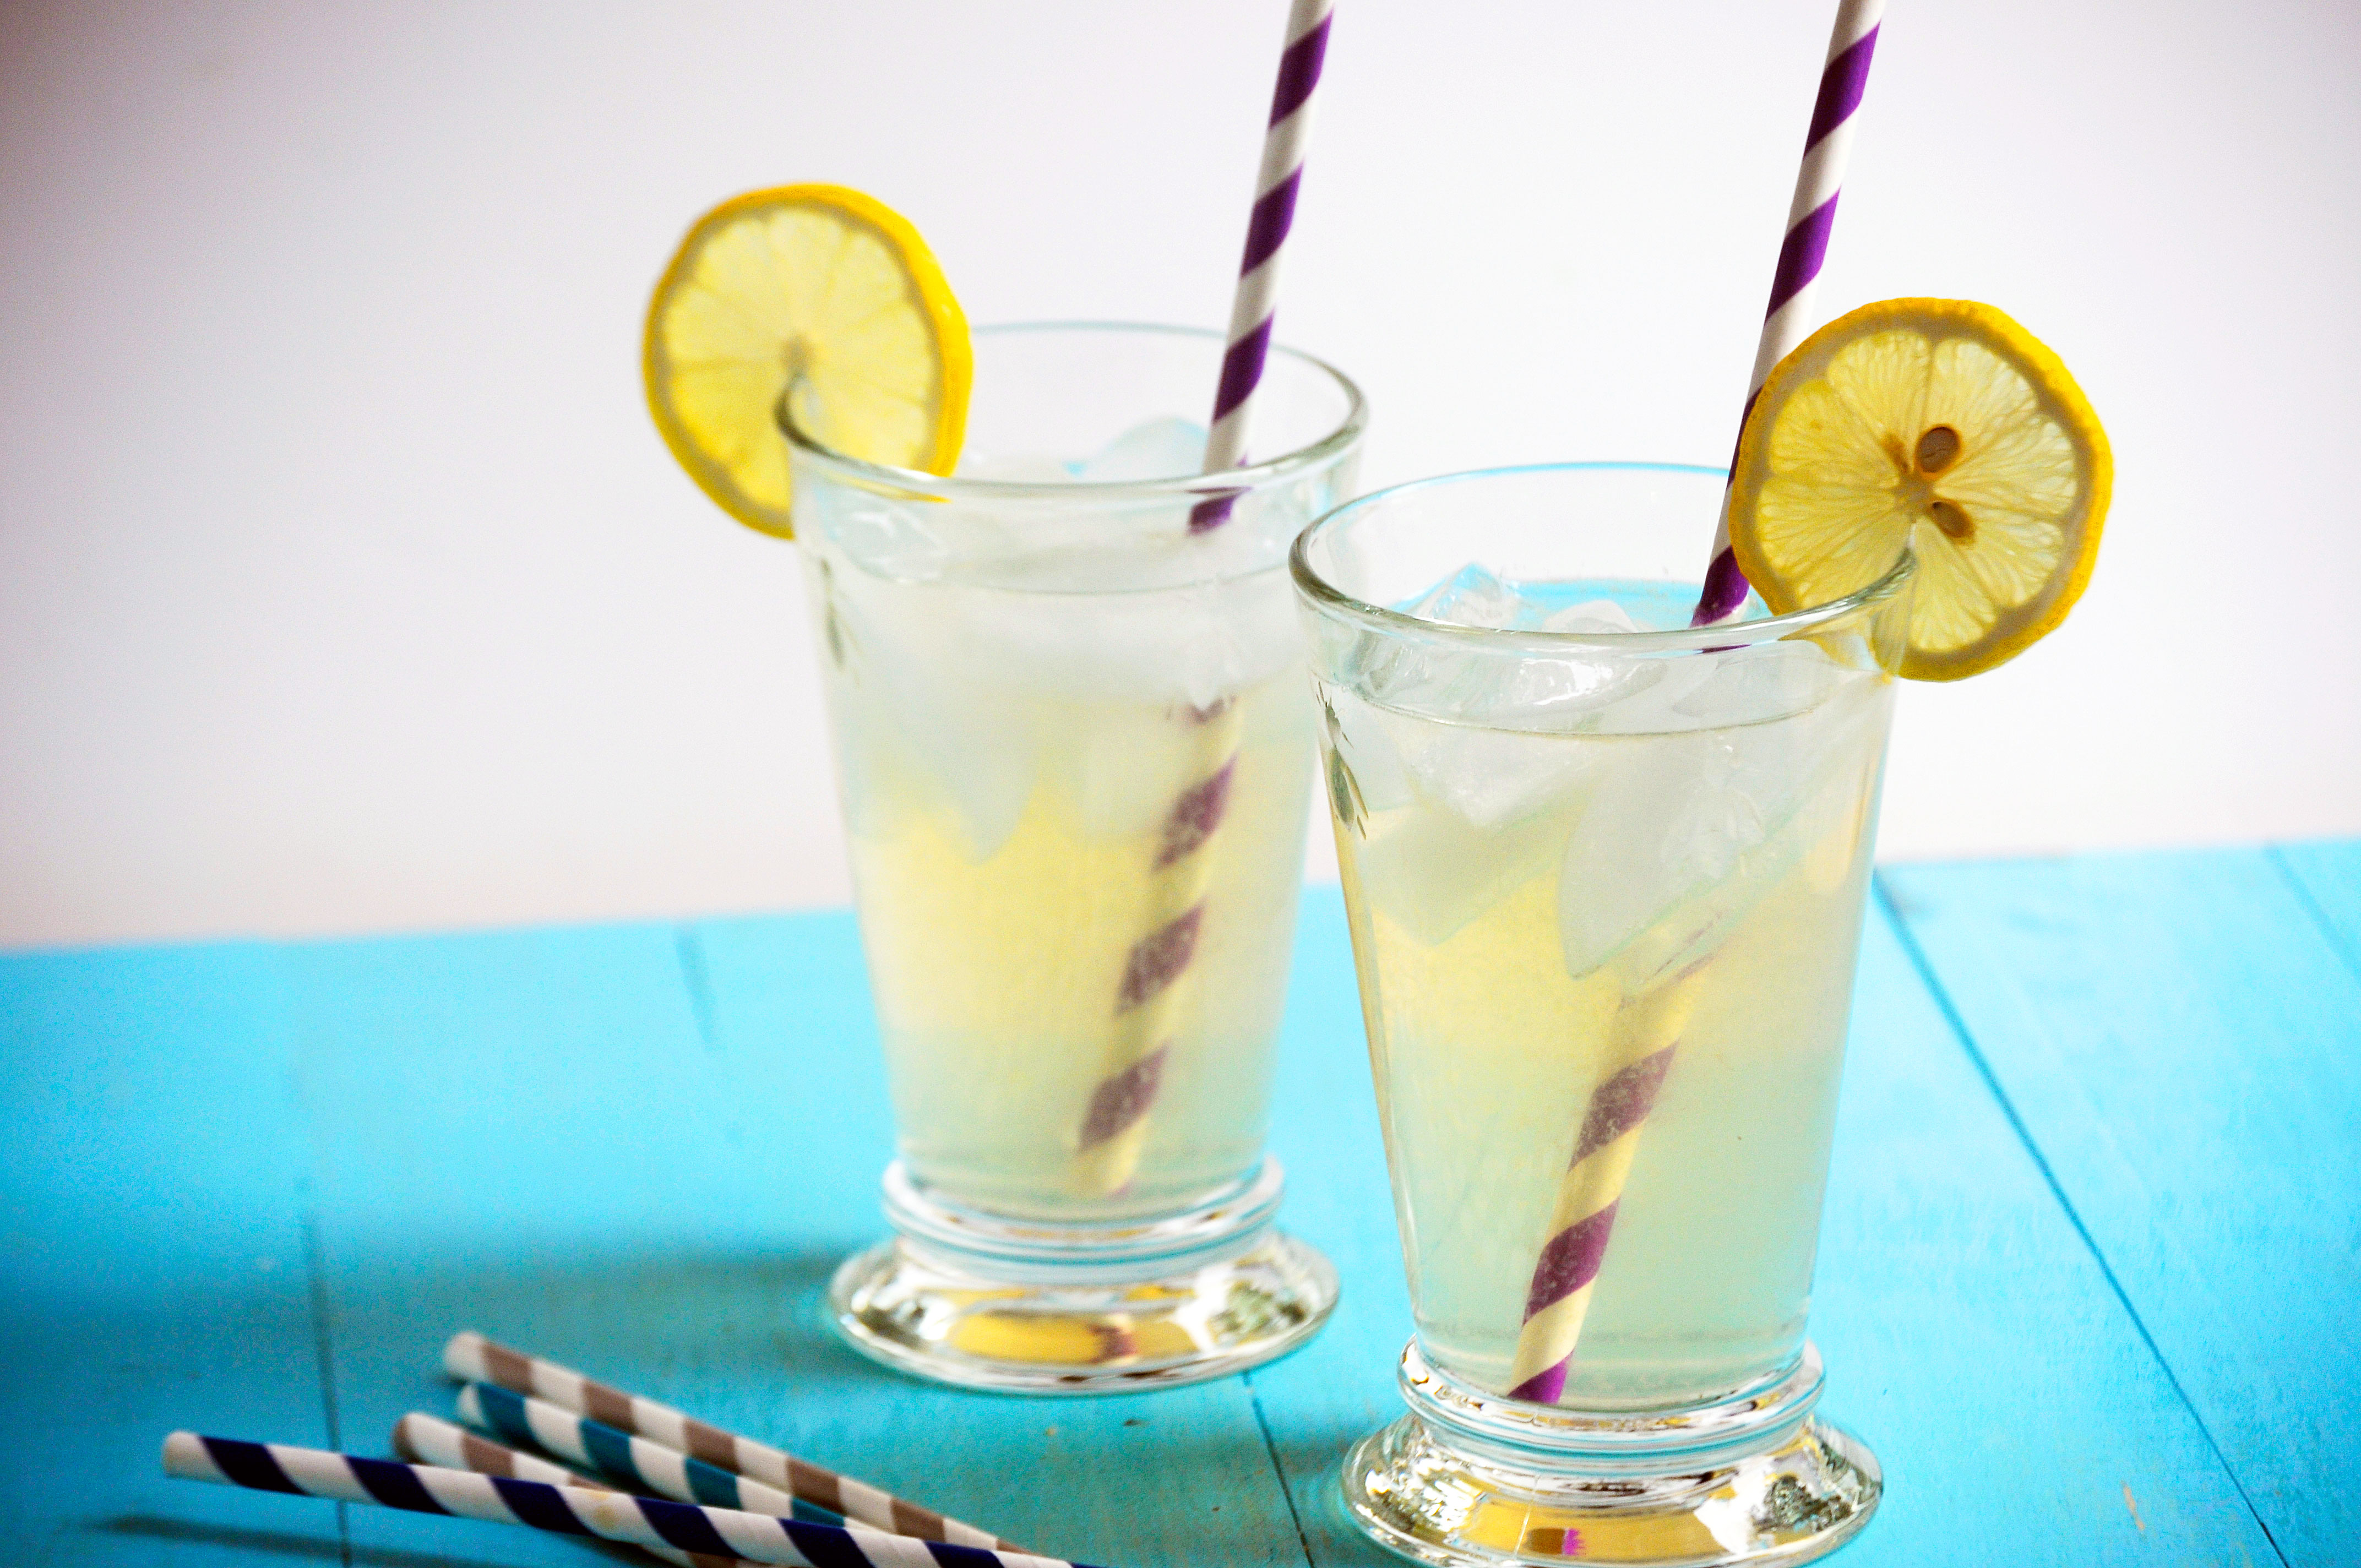 Spiked Vanilla Lemonade